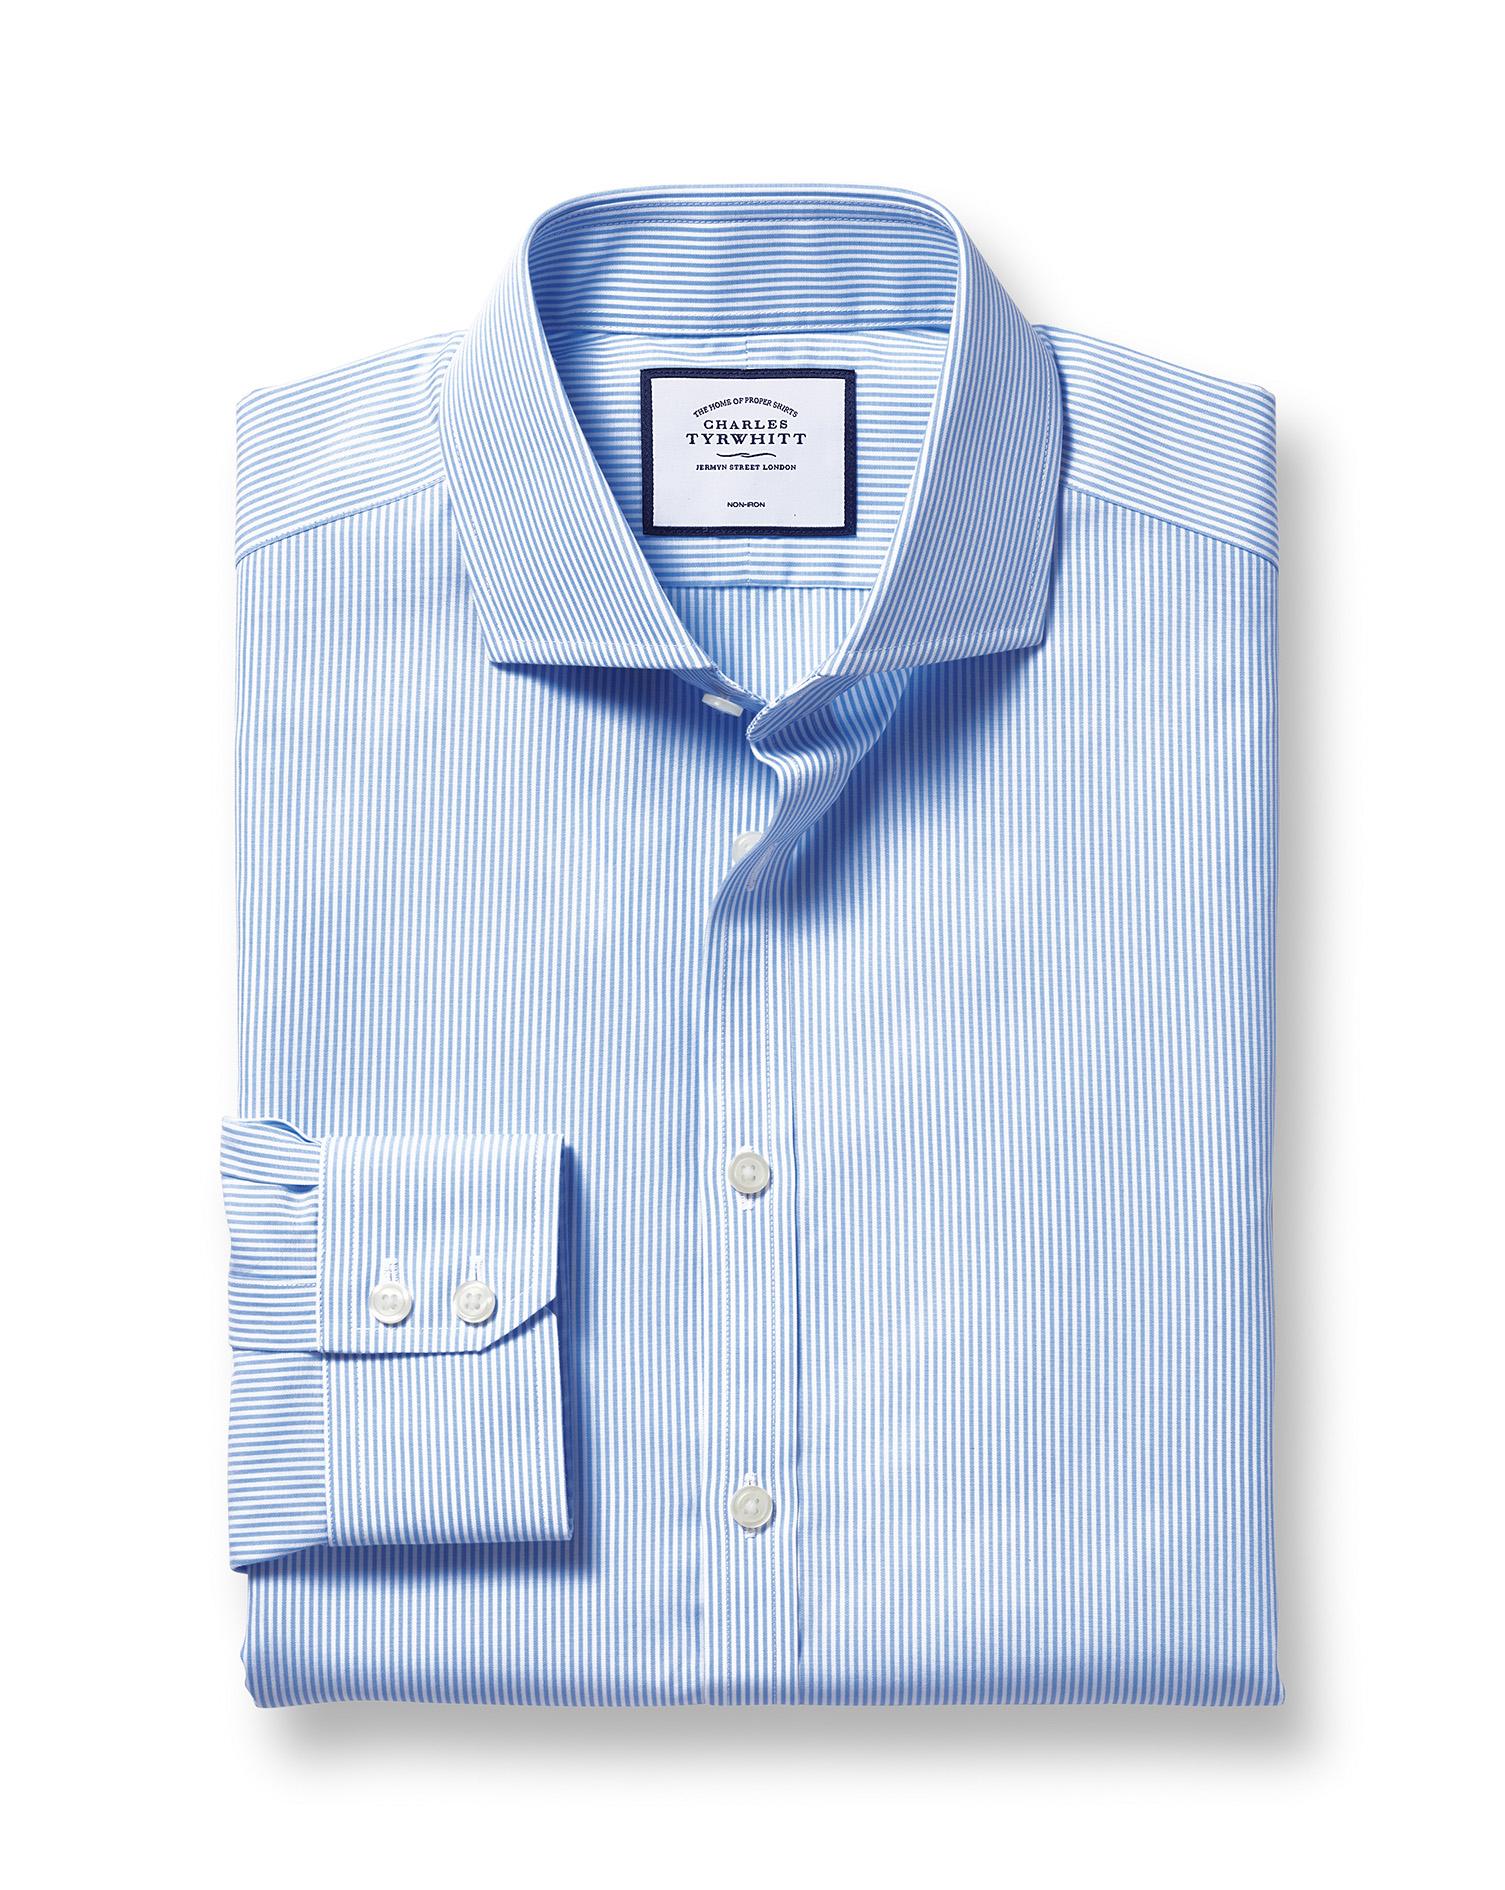 Extra Slim Fit Cutaway Non-Iron Bengal Stripe Sky Blue Cotton Formal Shirt Single Cuff Size 15.5/33